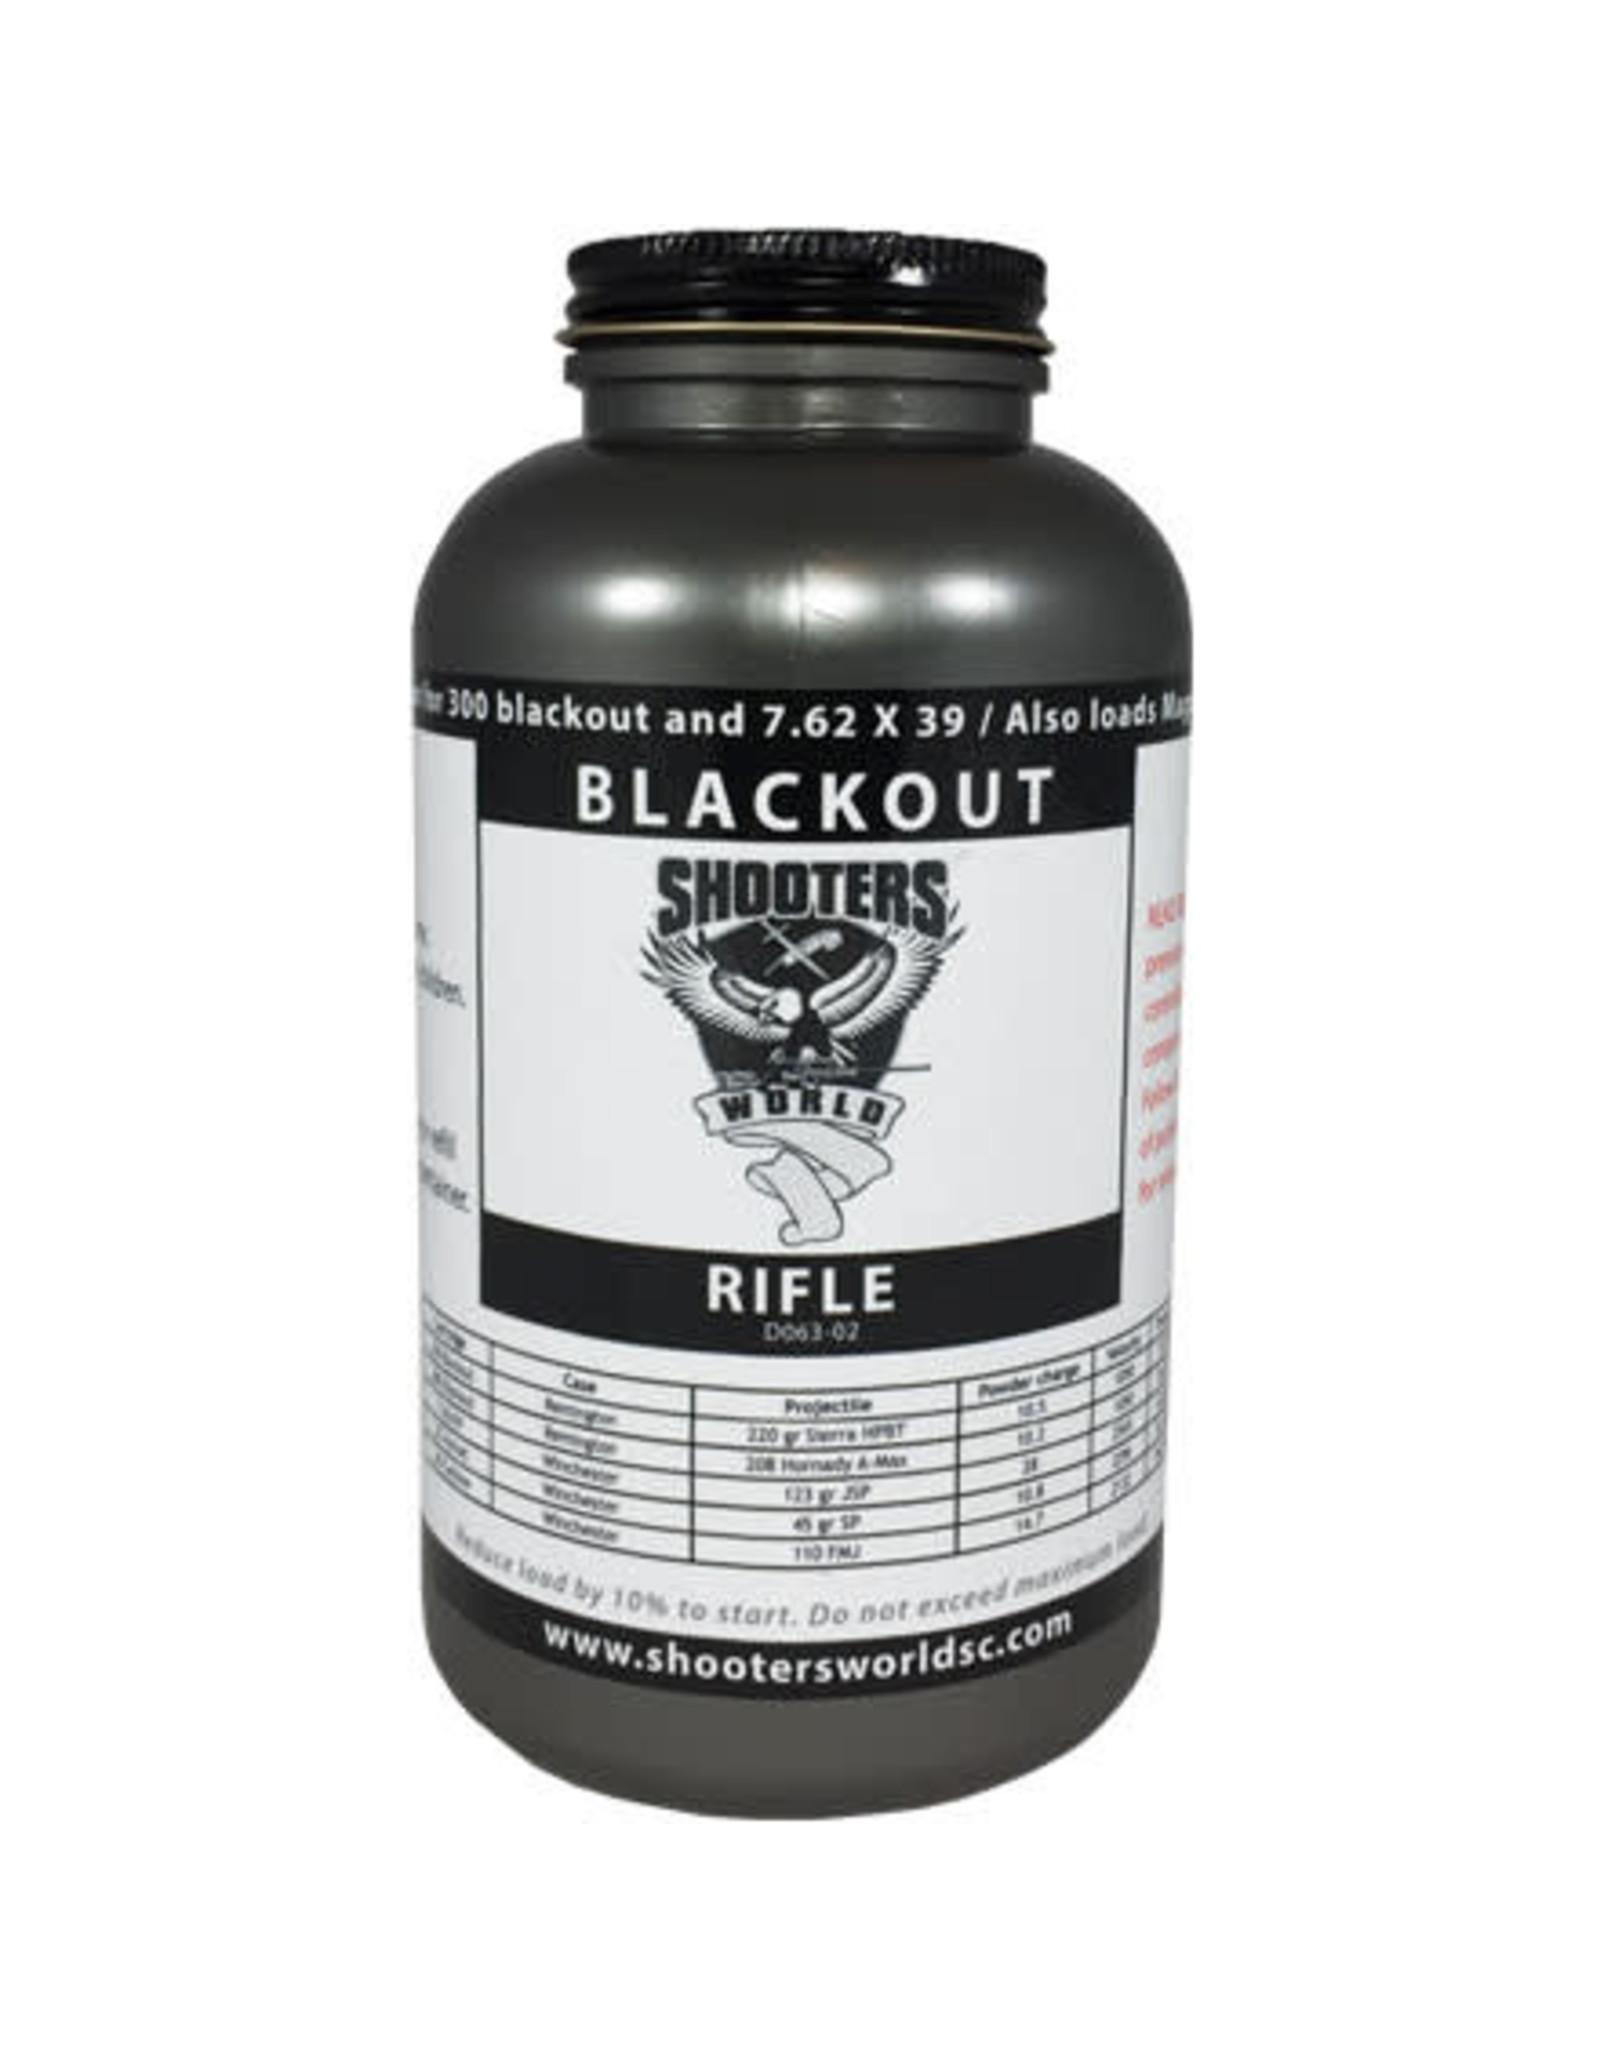 Shooter's World Shooter's World Blackout - 1 pound